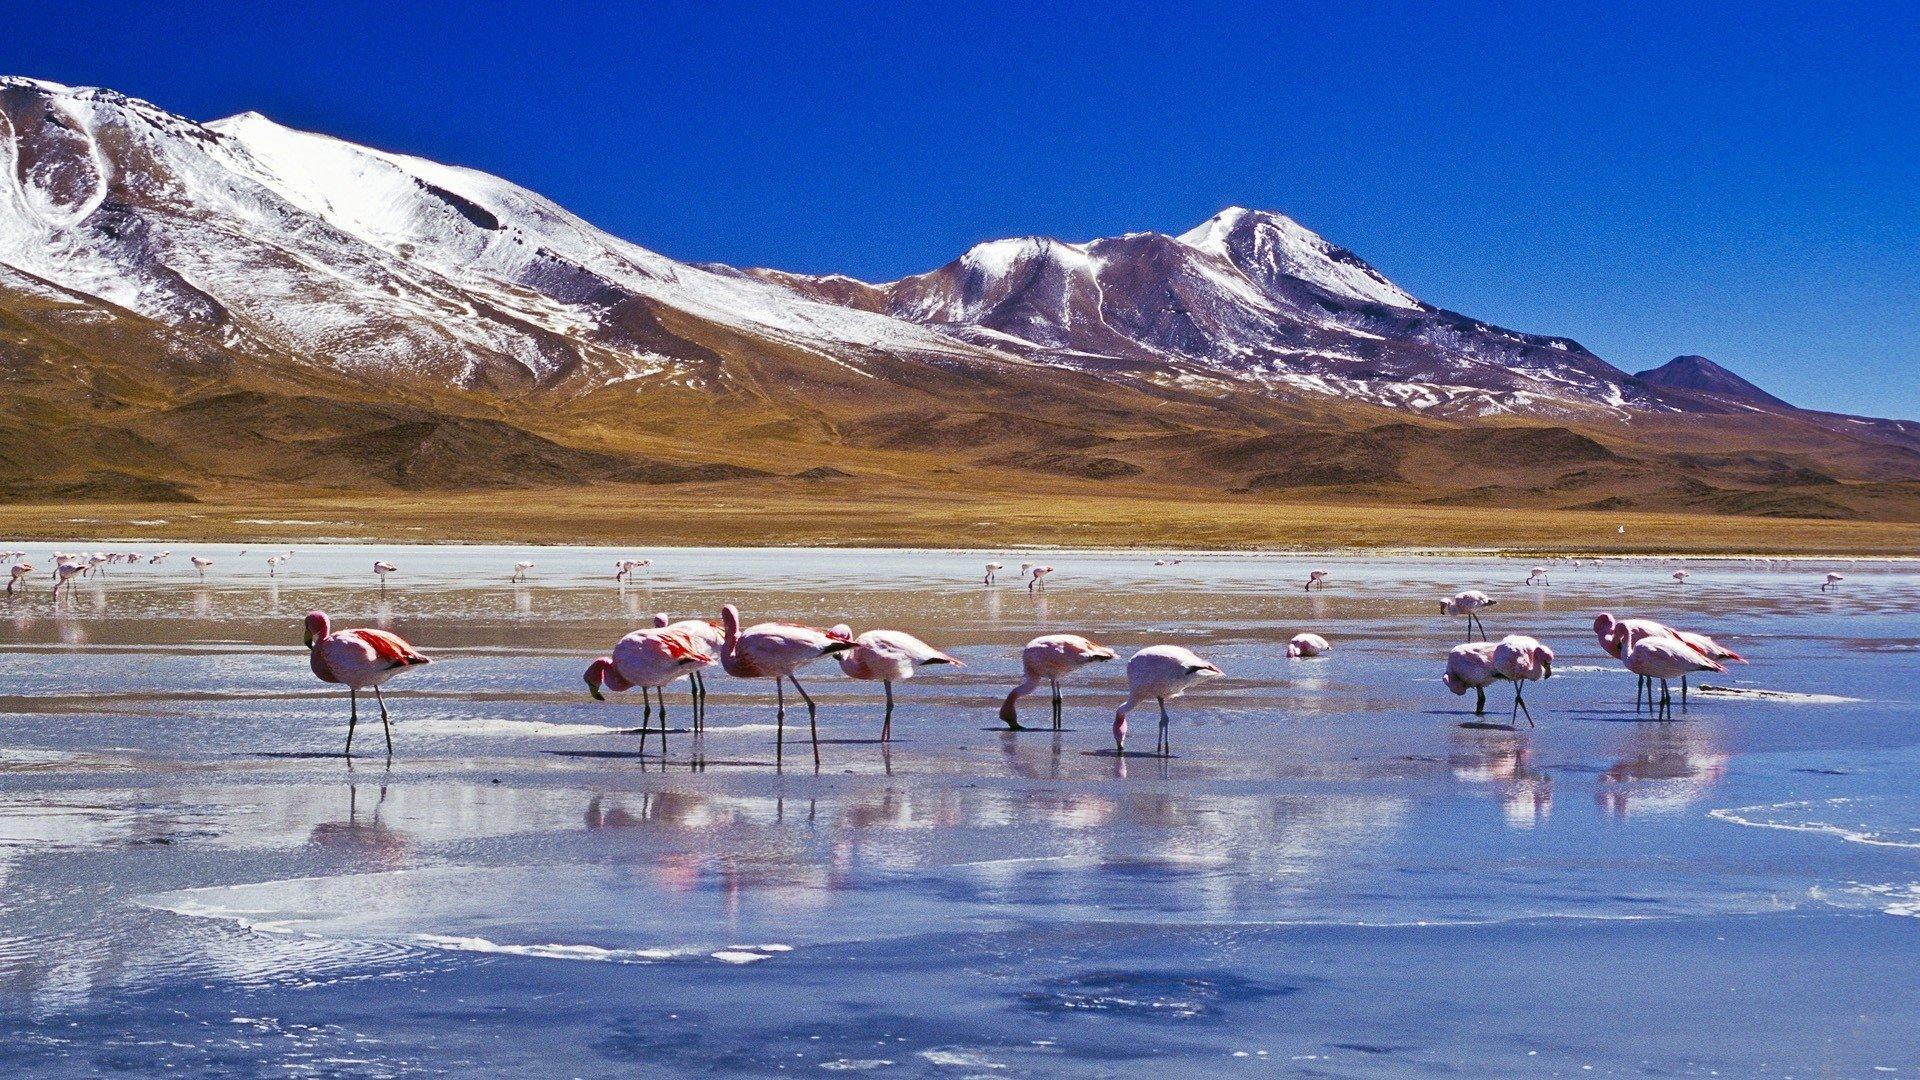 The Salar de Uyuni salt flats in Bolivia HD Wallpaper Background 1920x1080